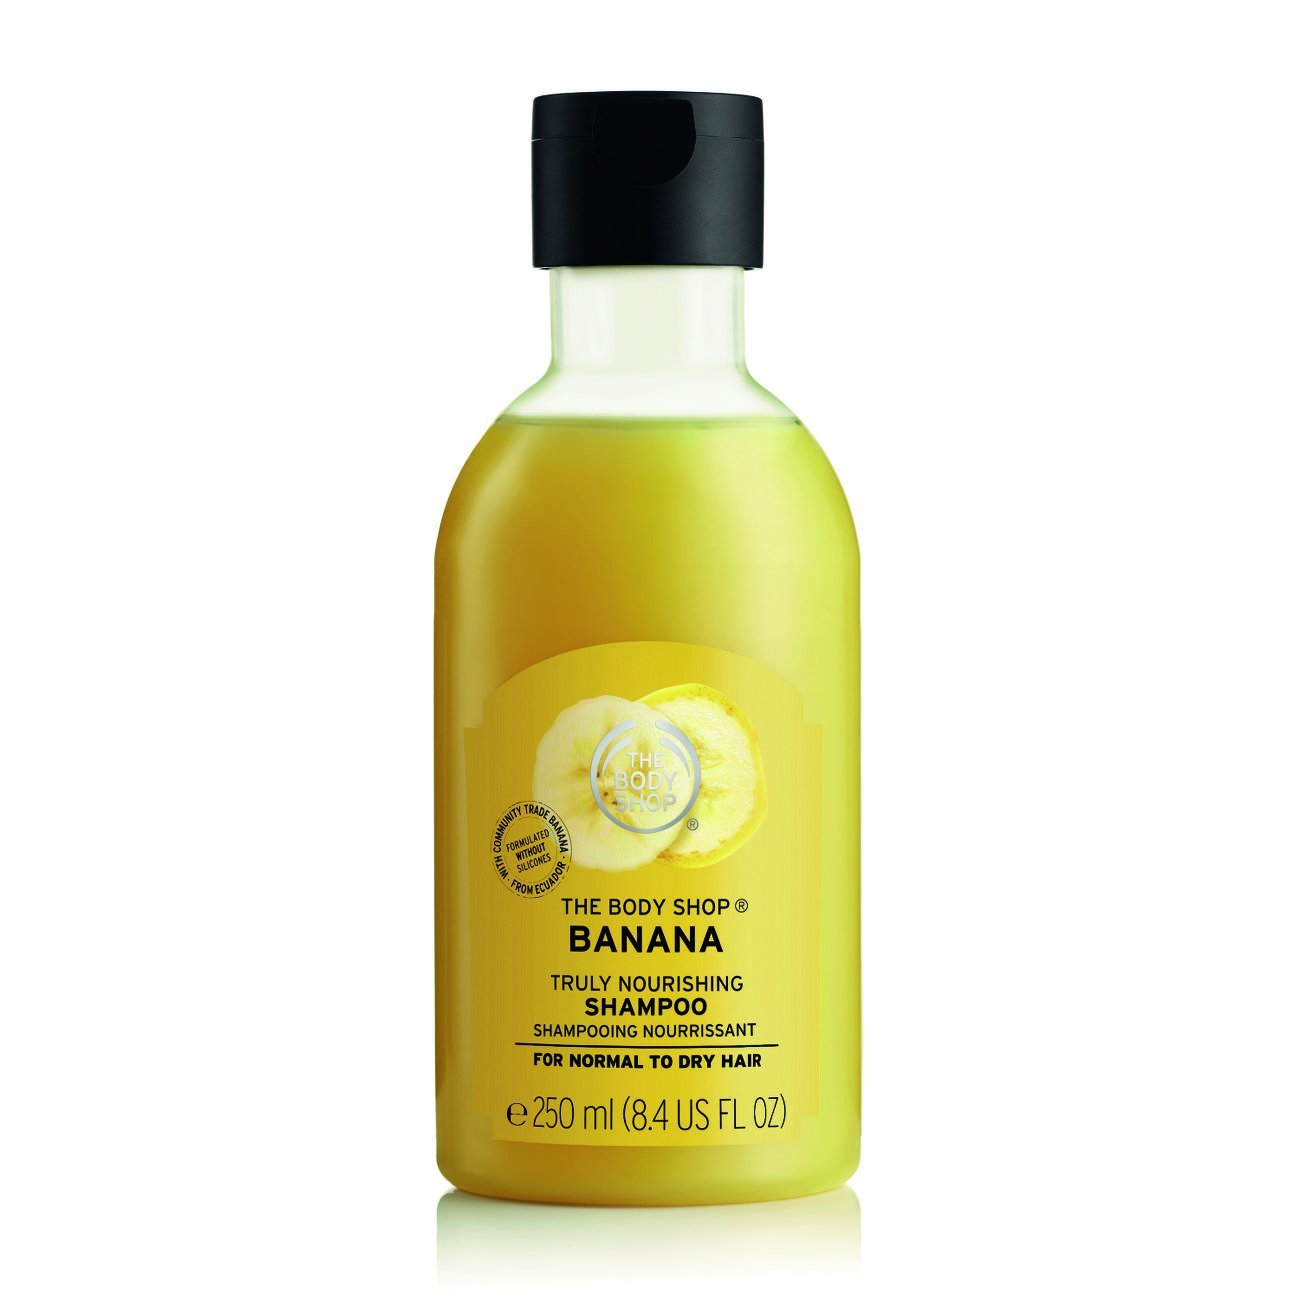 The Body Shop Banana Shampoo Review The Body Shop Banana